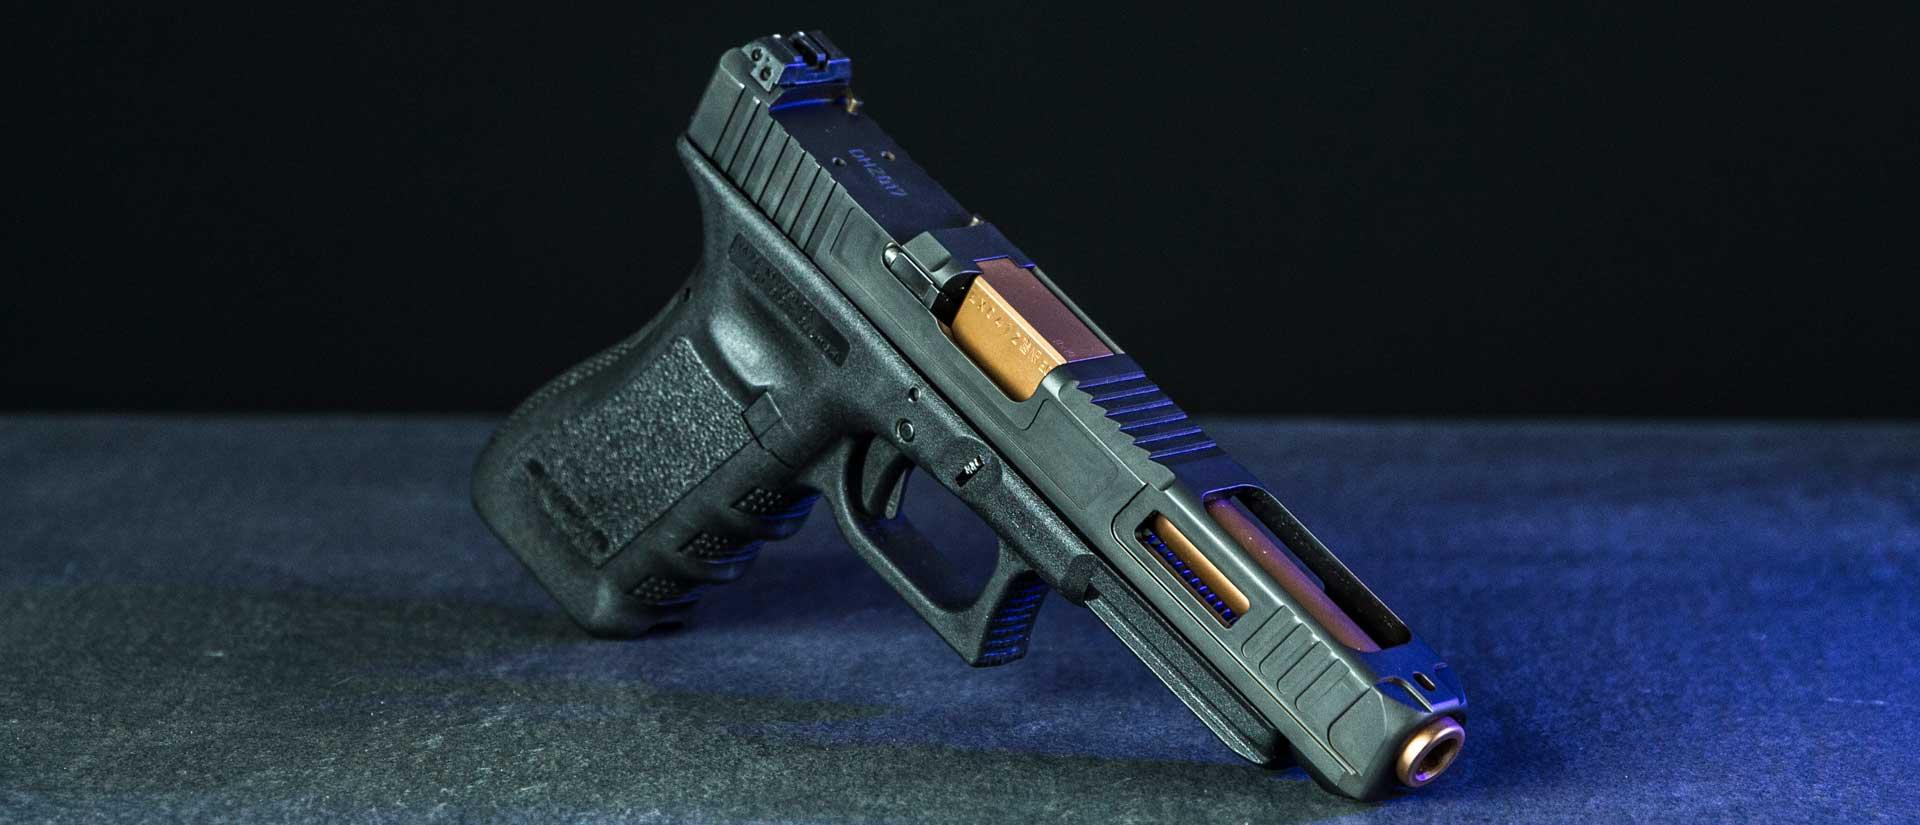 verex-tactical-tuning-waffen-pistole-glock-sig-sauer-17-cz-walther-visier-bruenieren-ar15-red-dot-beschichtung-tuning-cerakote-stippling-griptech-salzburg-slider-07